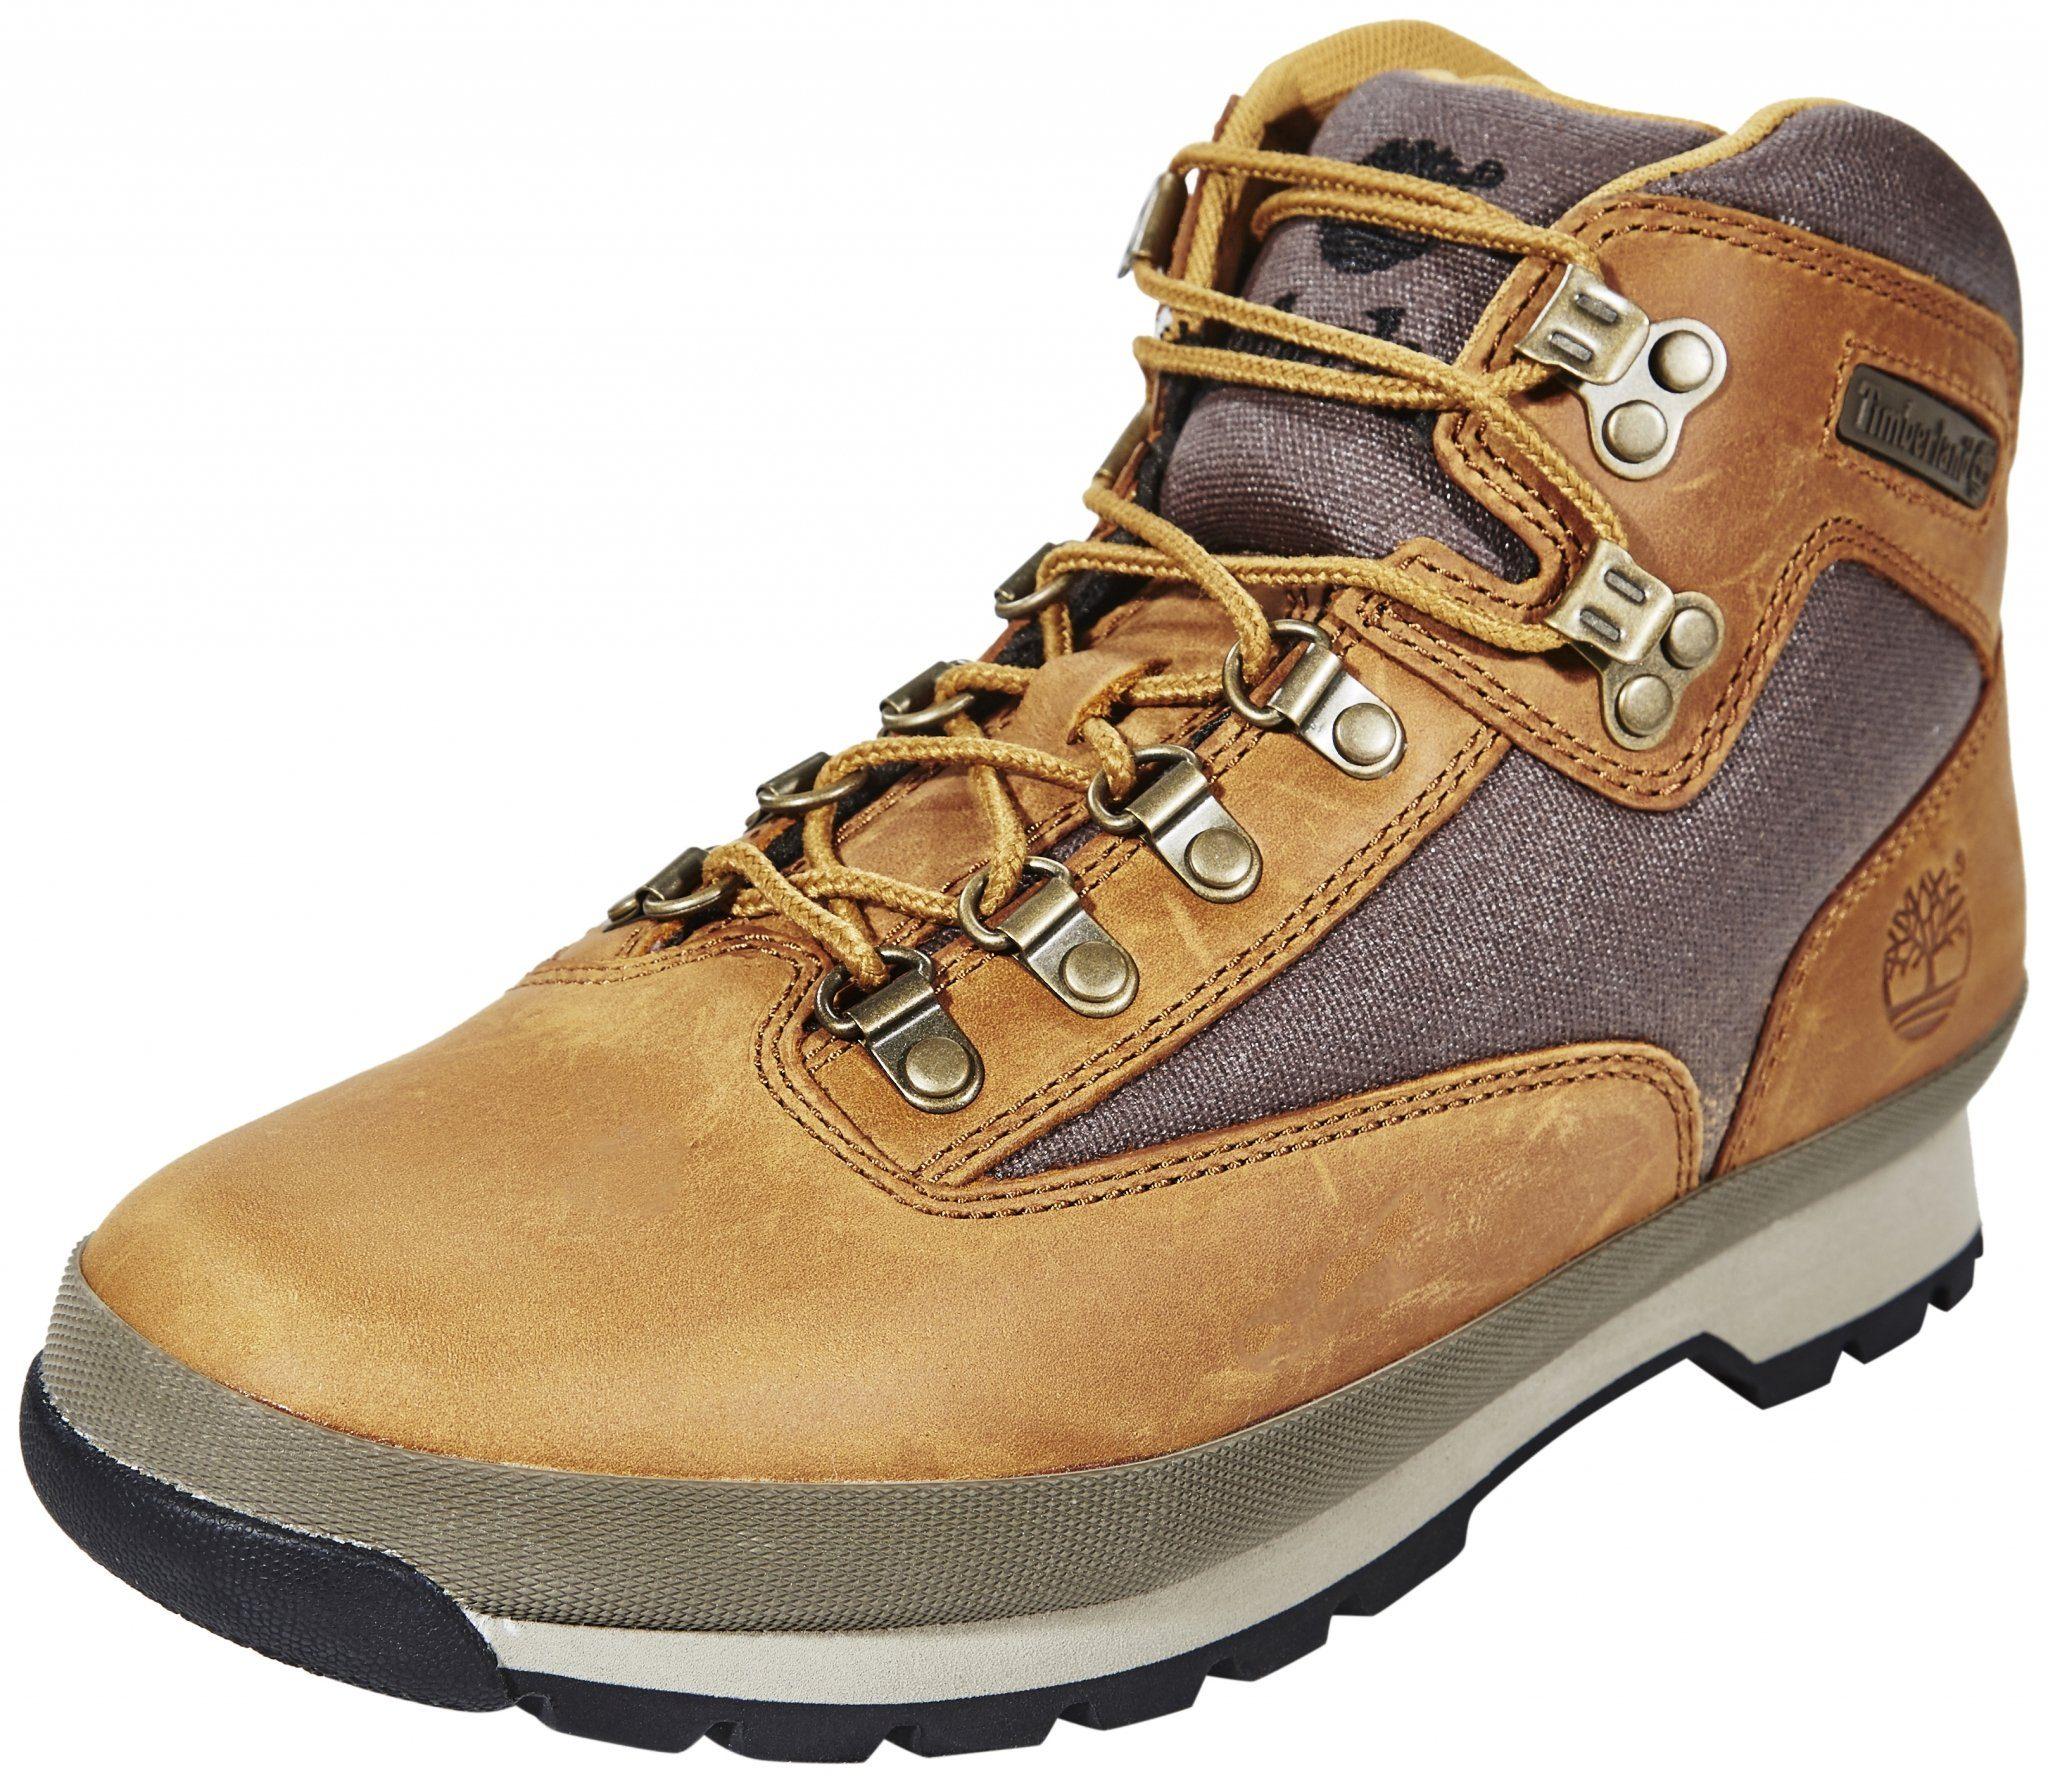 TIMBERLAND Kletterschuh »Euro Hiker F/L Shoes Men«